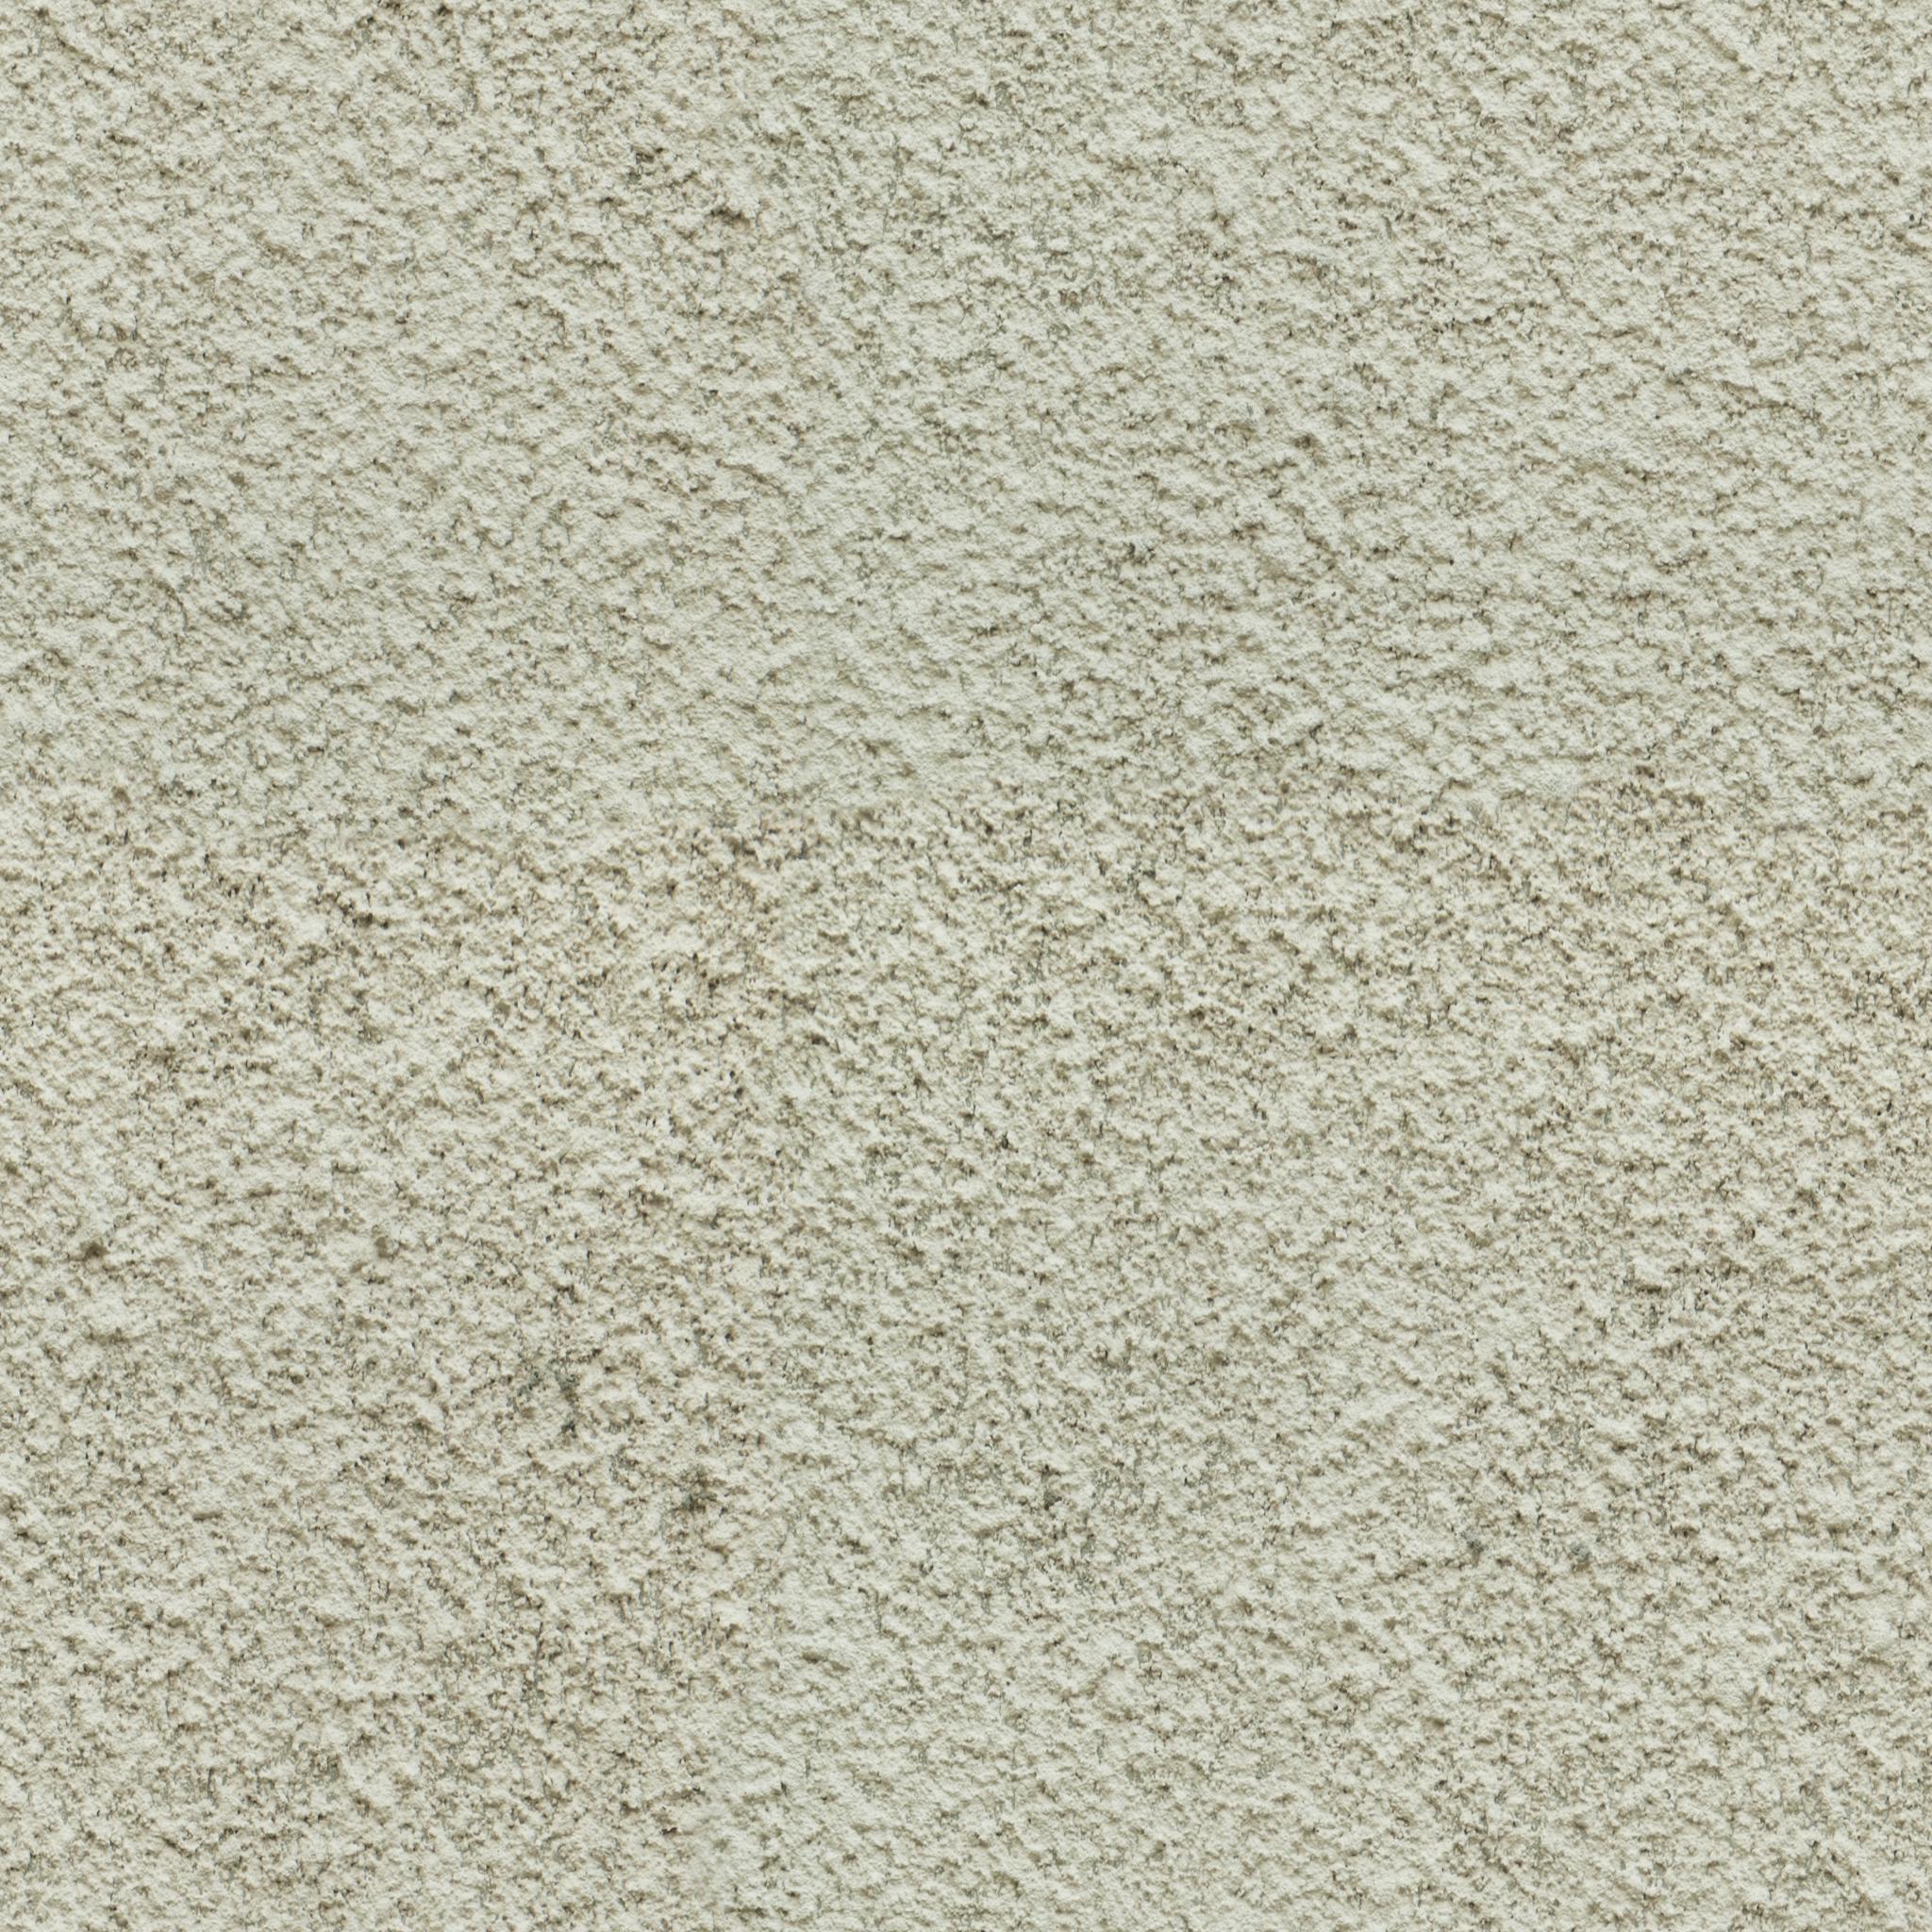 Coarse Gray Stucco.jpg